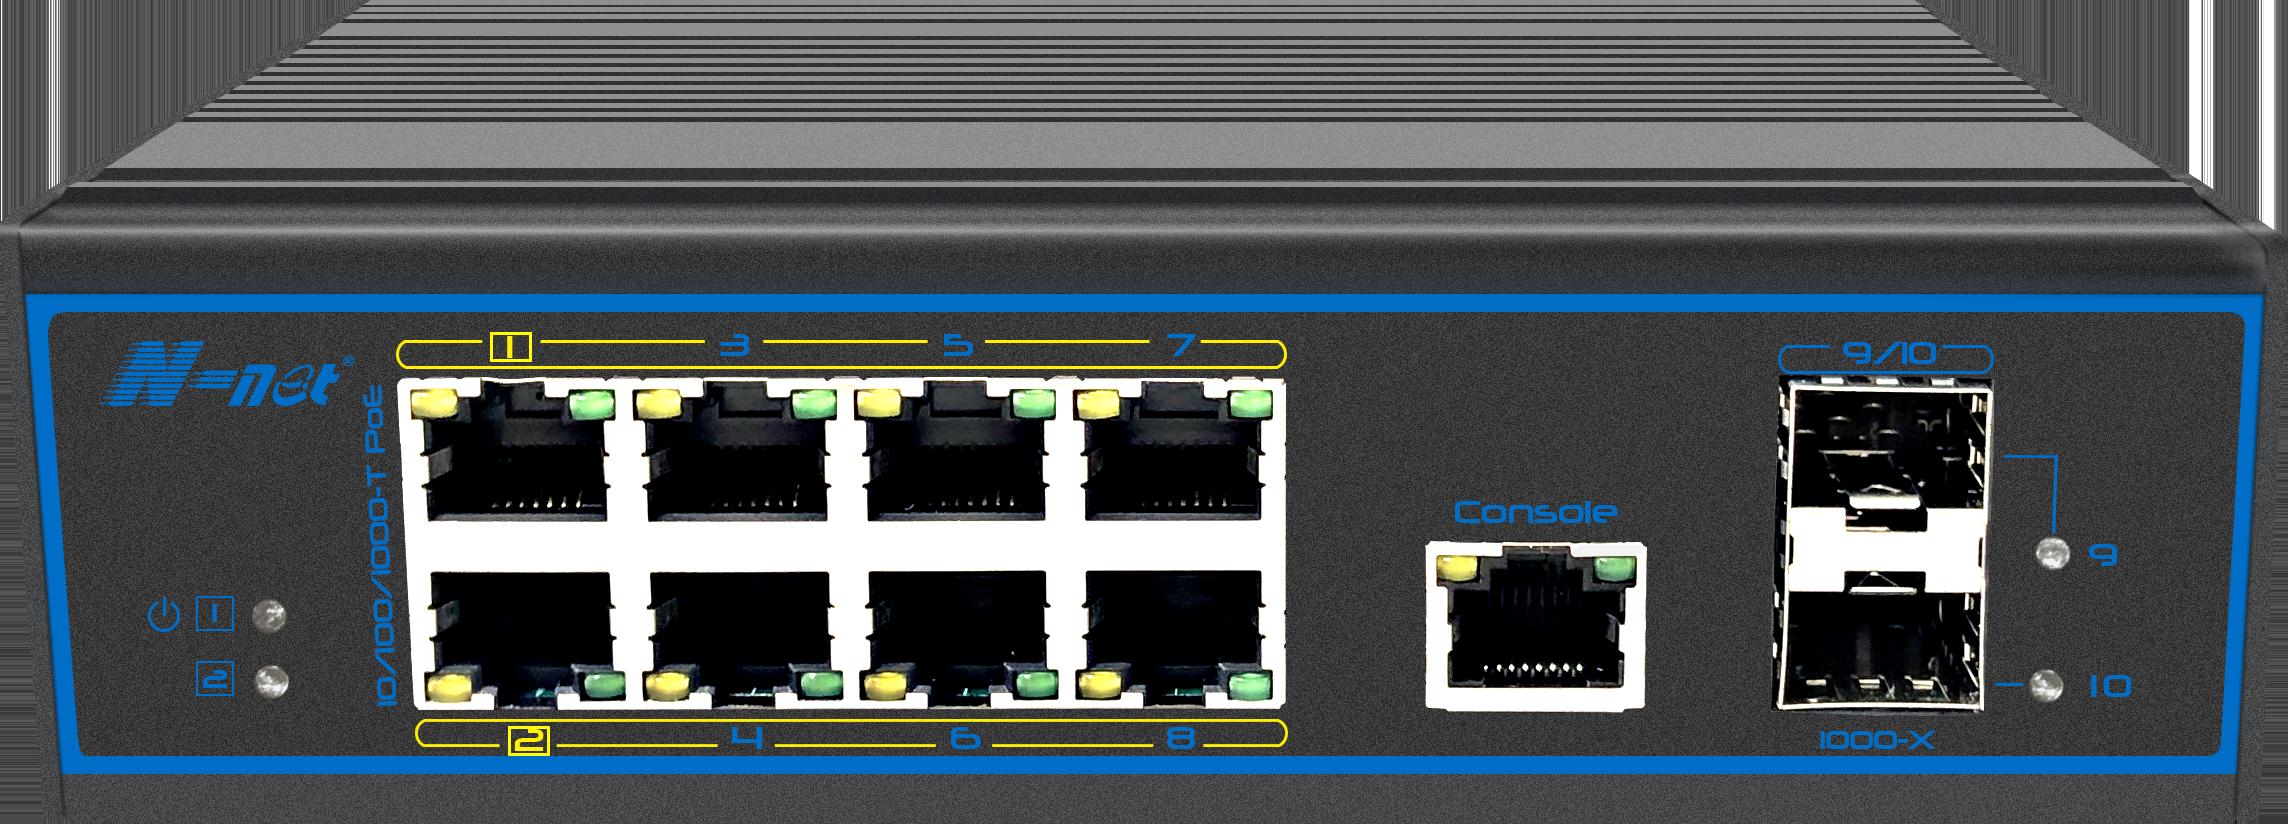 NIE8082PGM 10口全千兆网管型PoE交换机